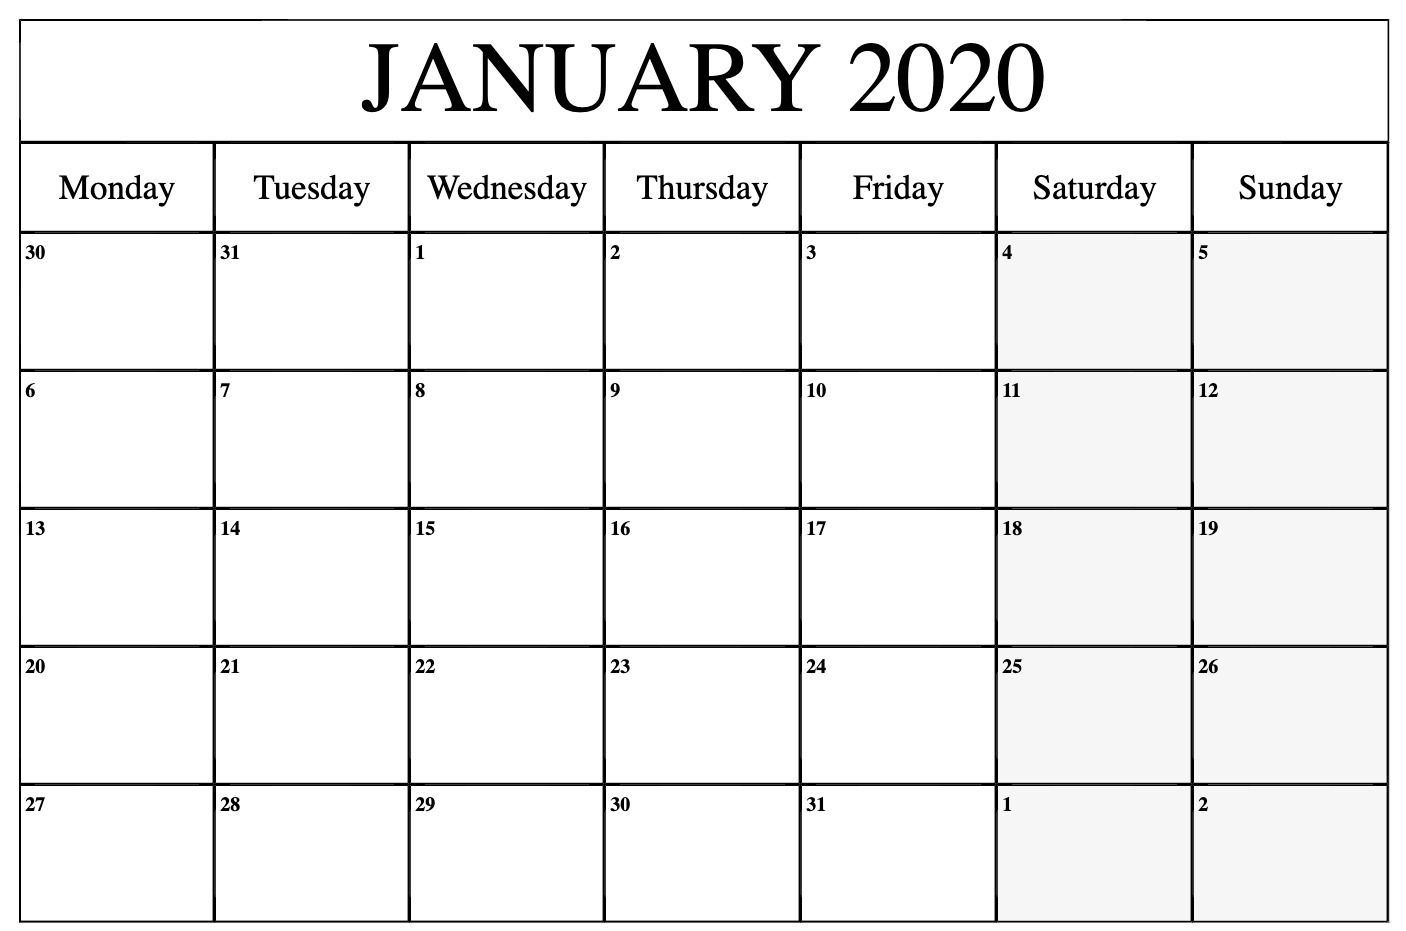 Free January 2020 Calendar Printable Template Pdf, Word